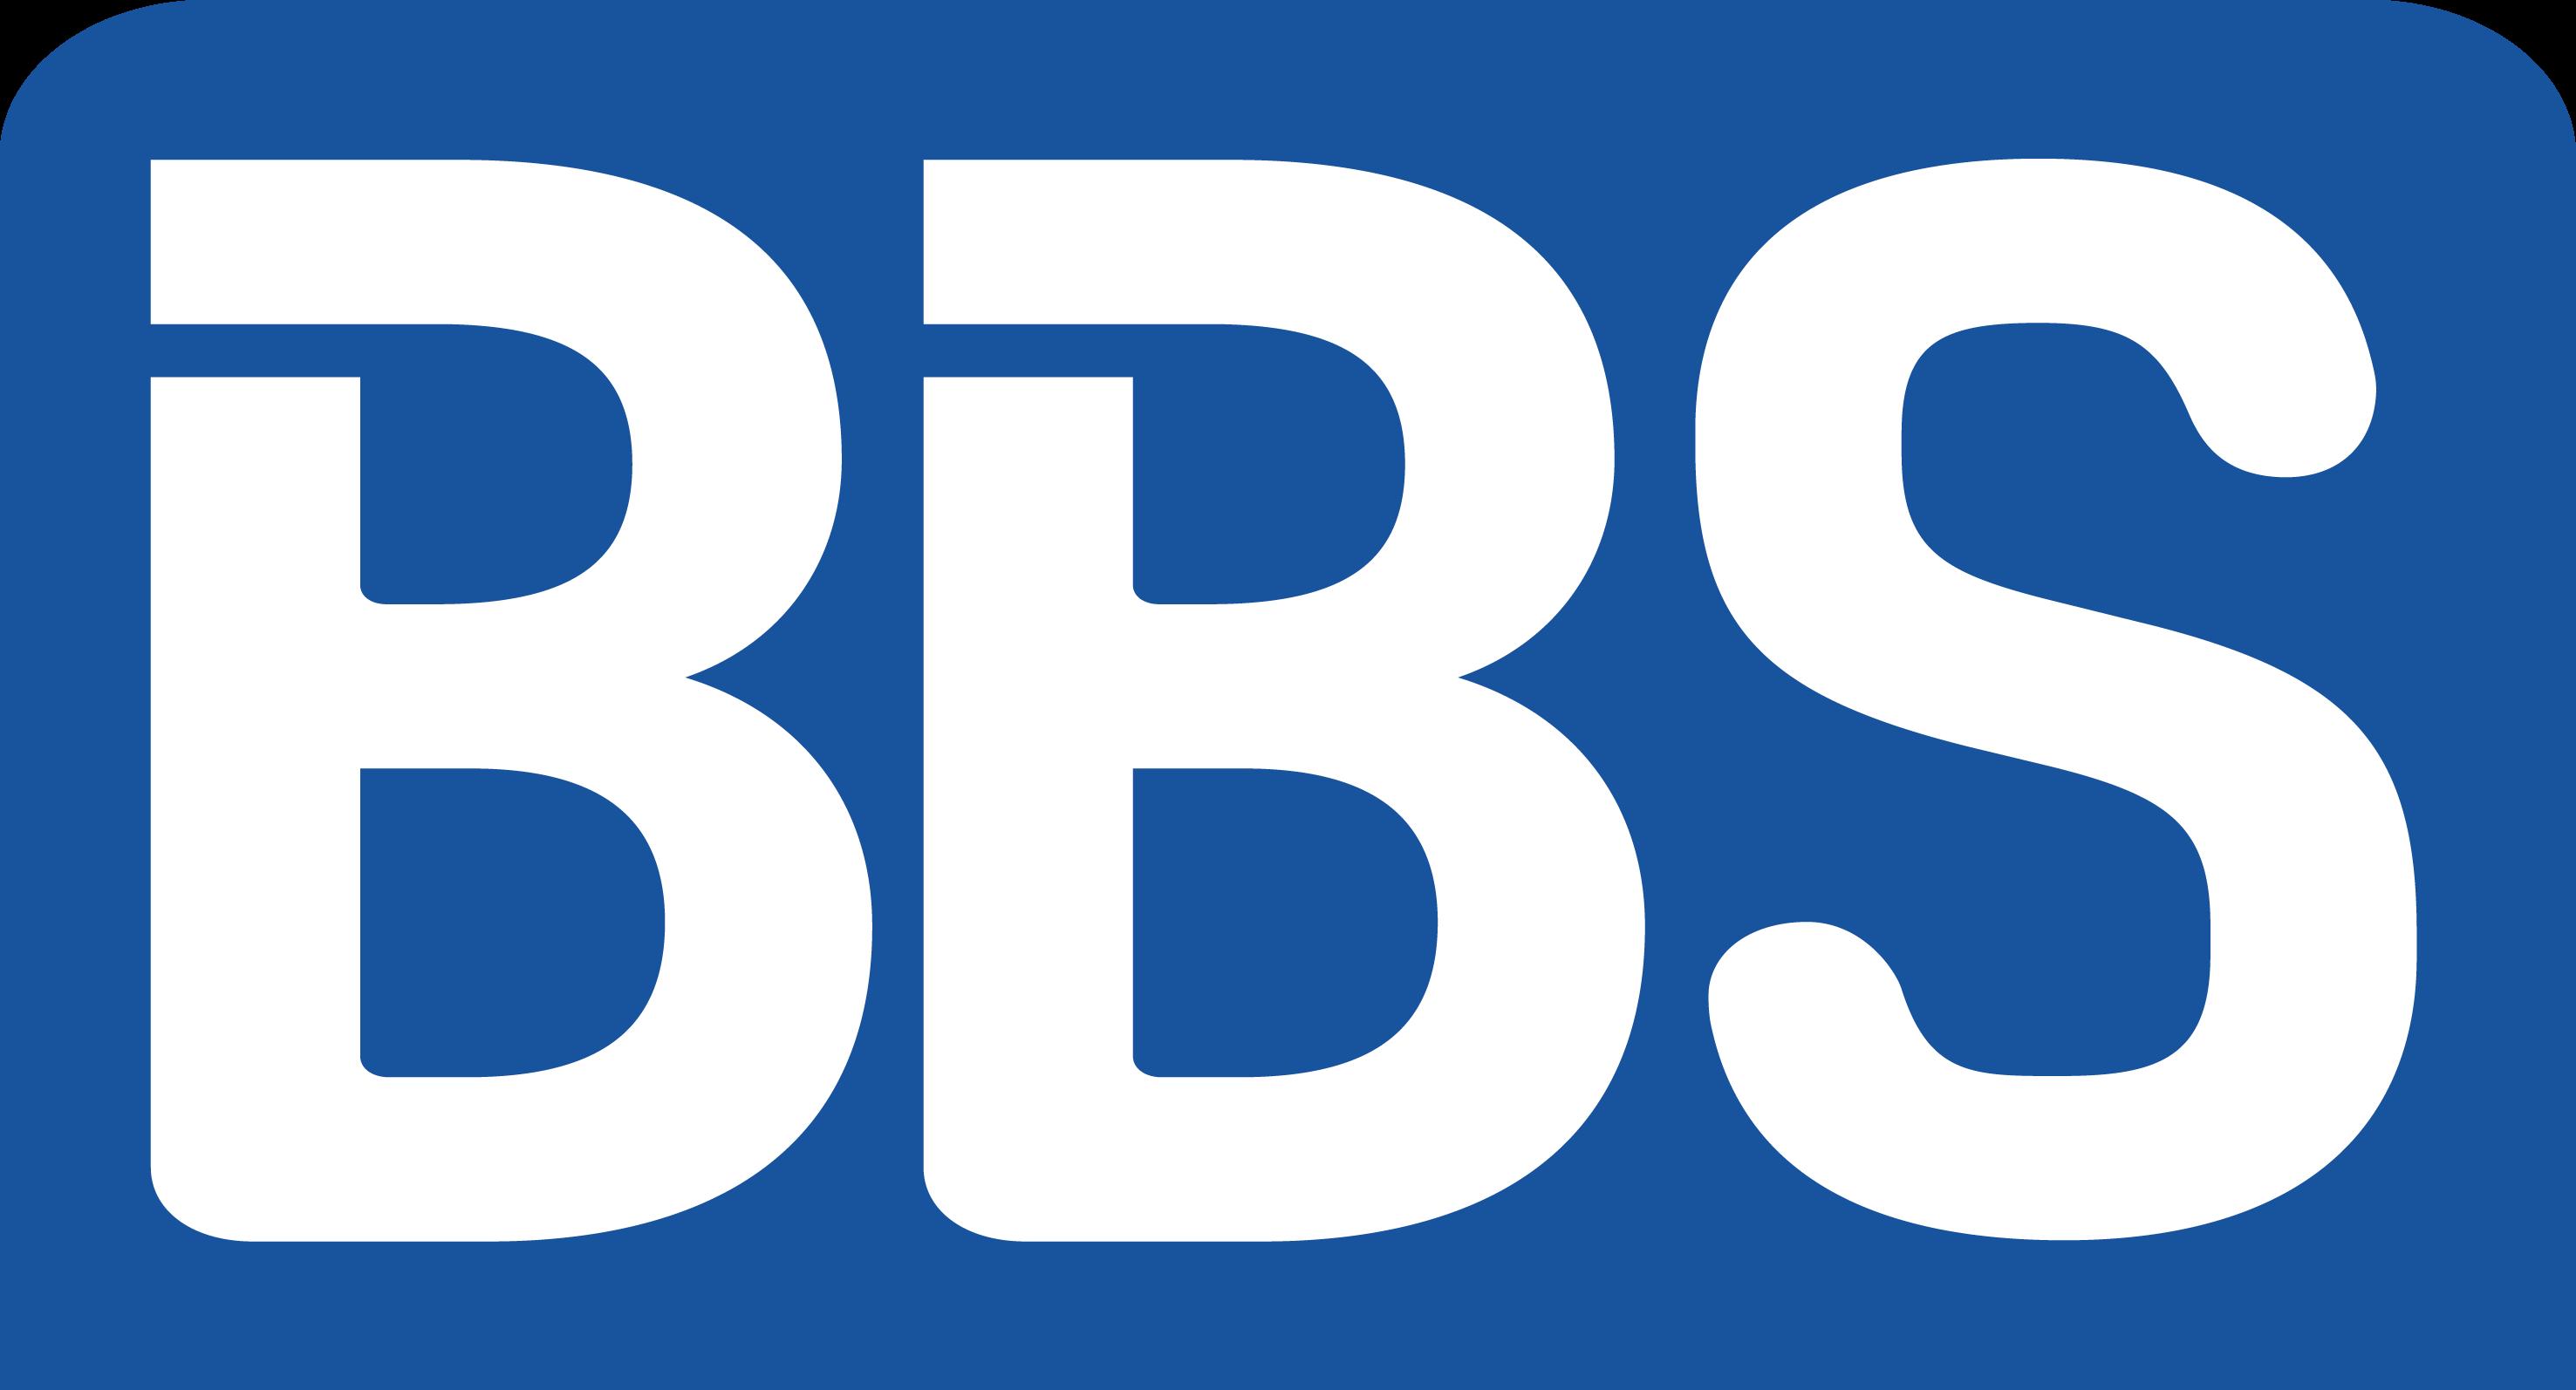 BBS Informatique